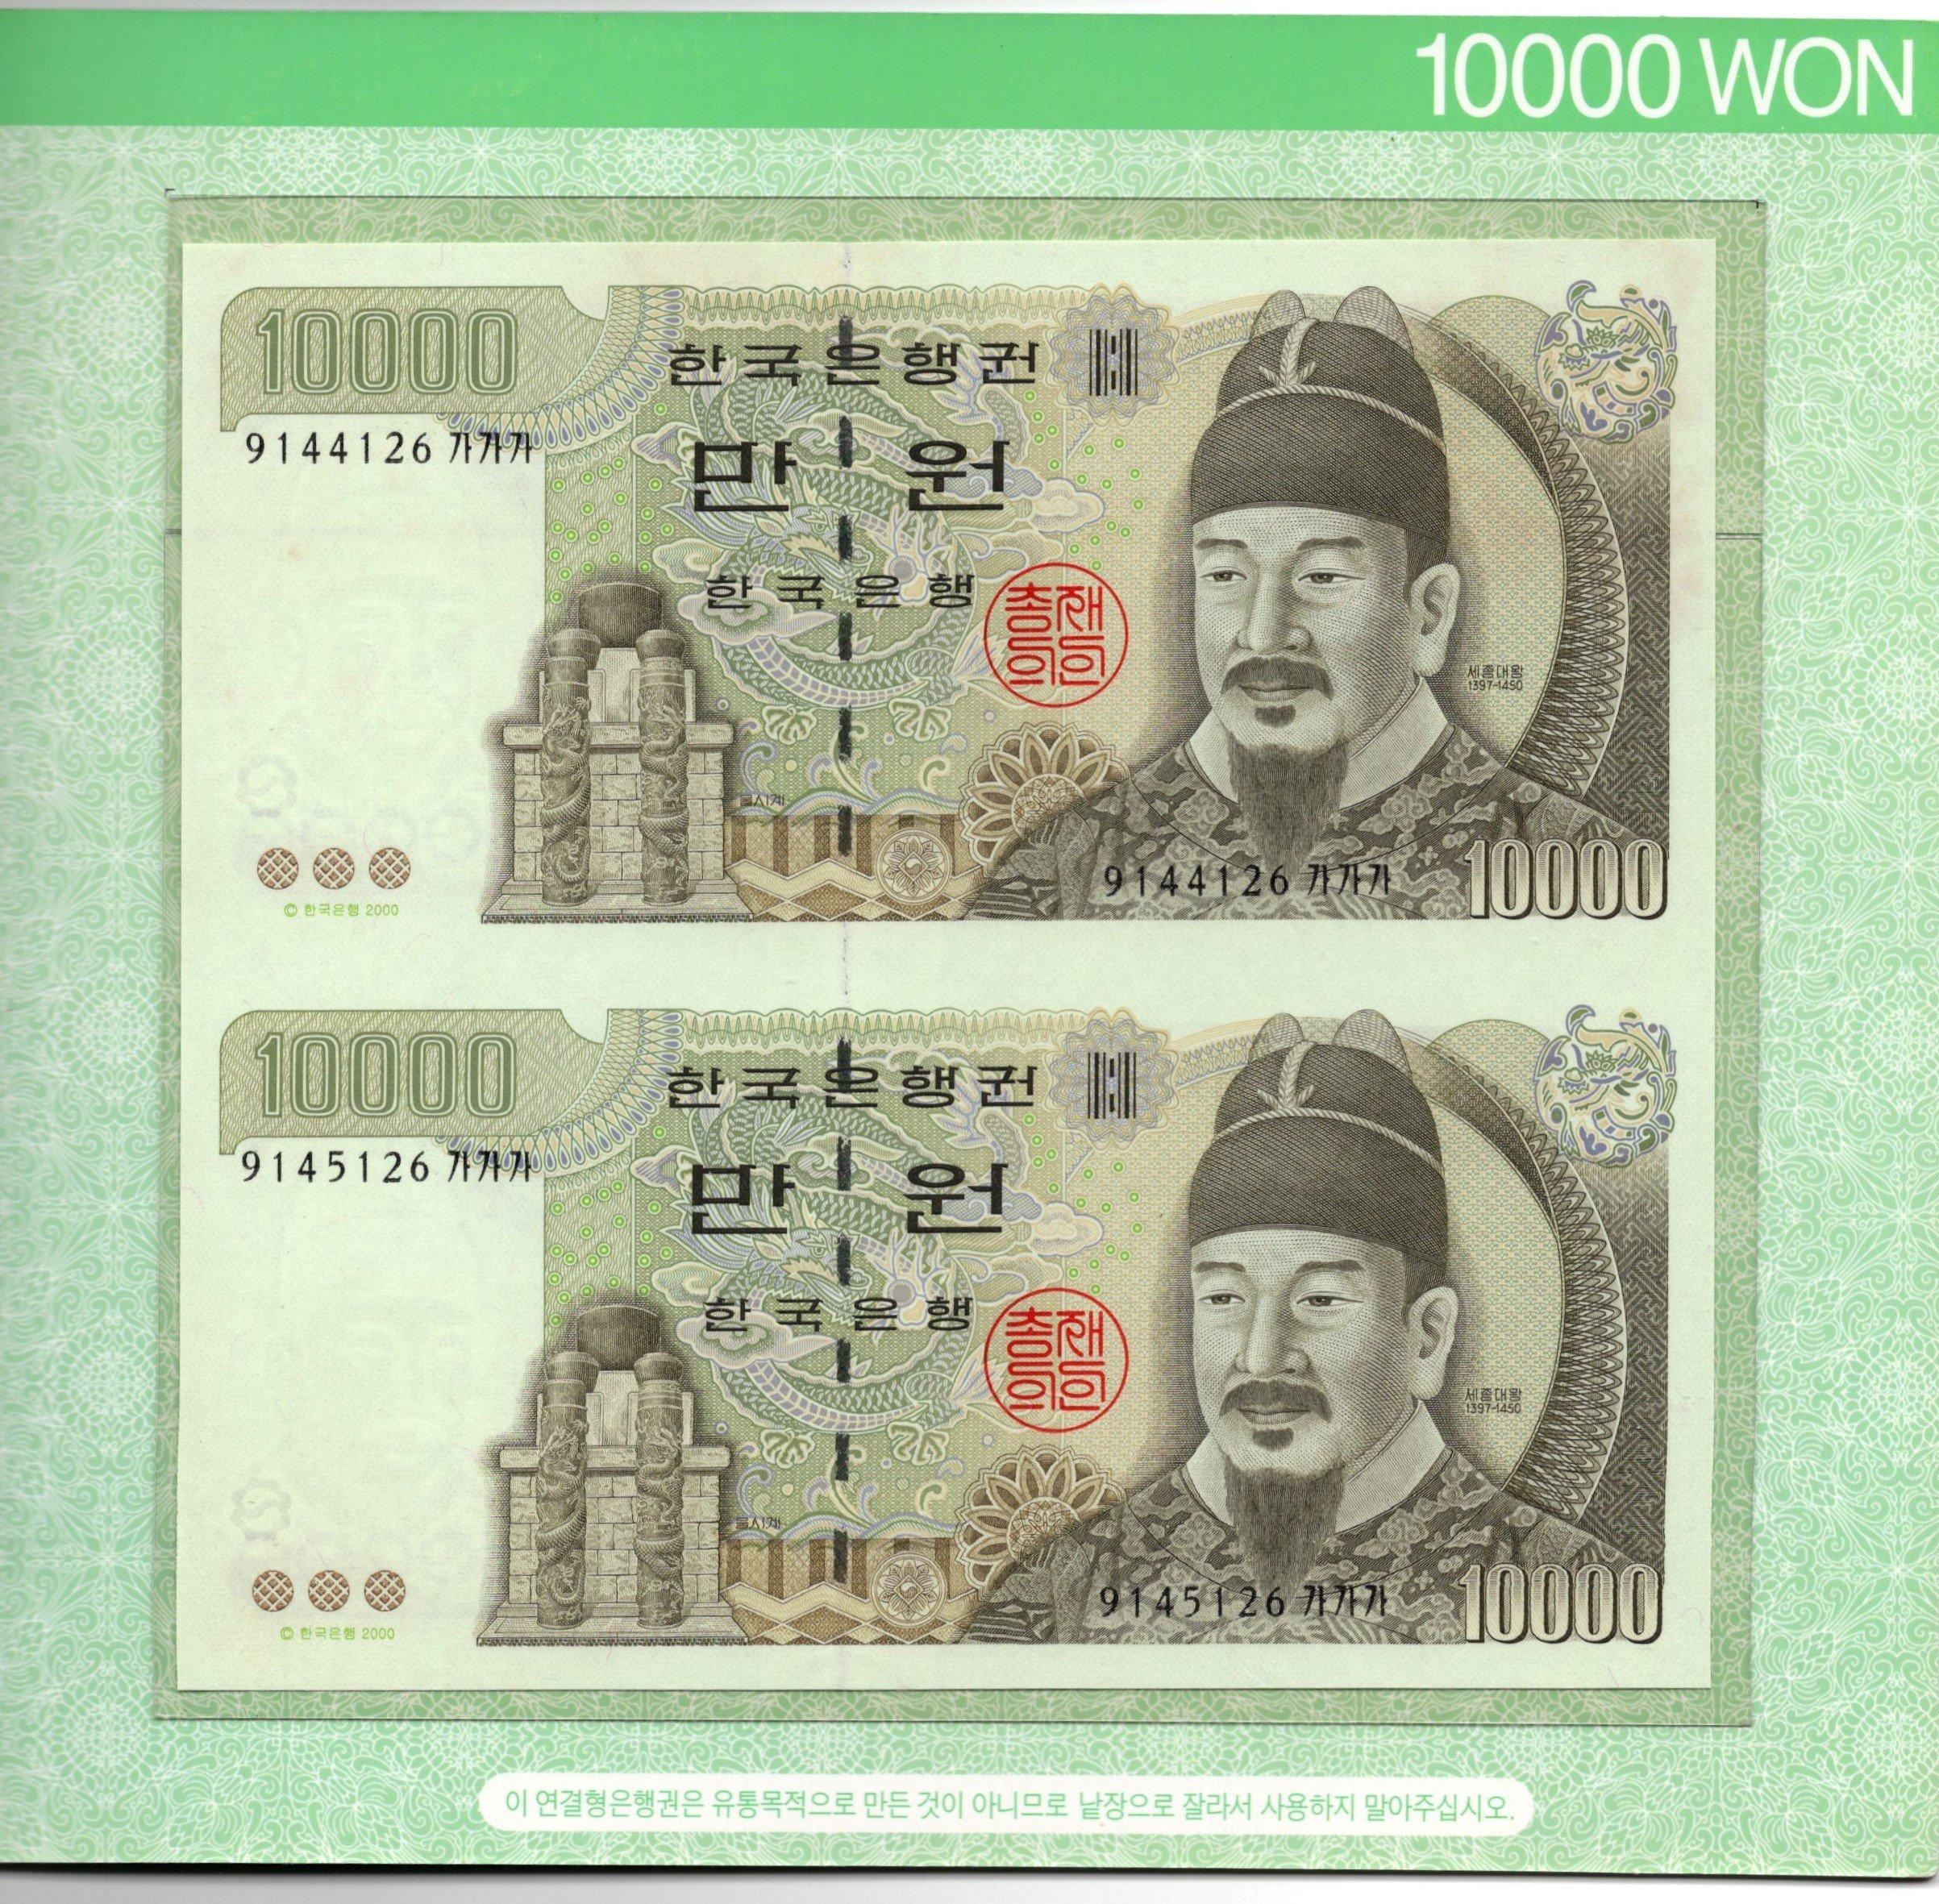 korea 10000 uncut old